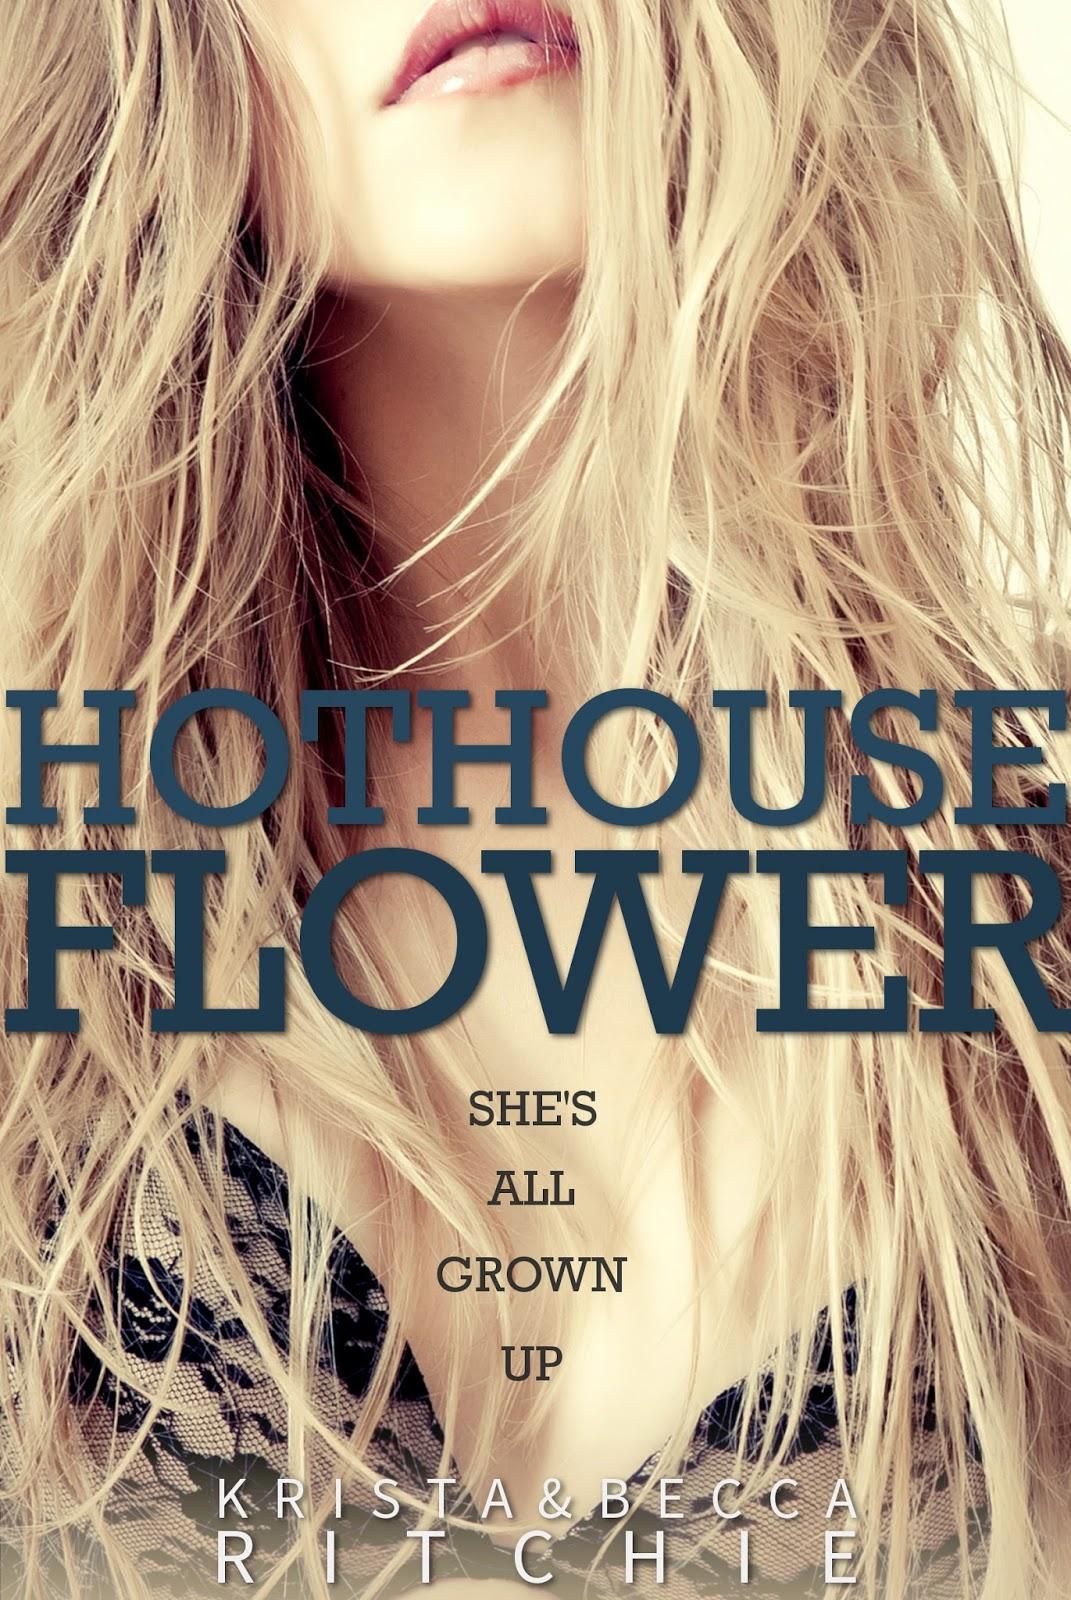 Burning x Impossibly x Bright Hothouse Flower Promo Tour Daisy & Ryke C